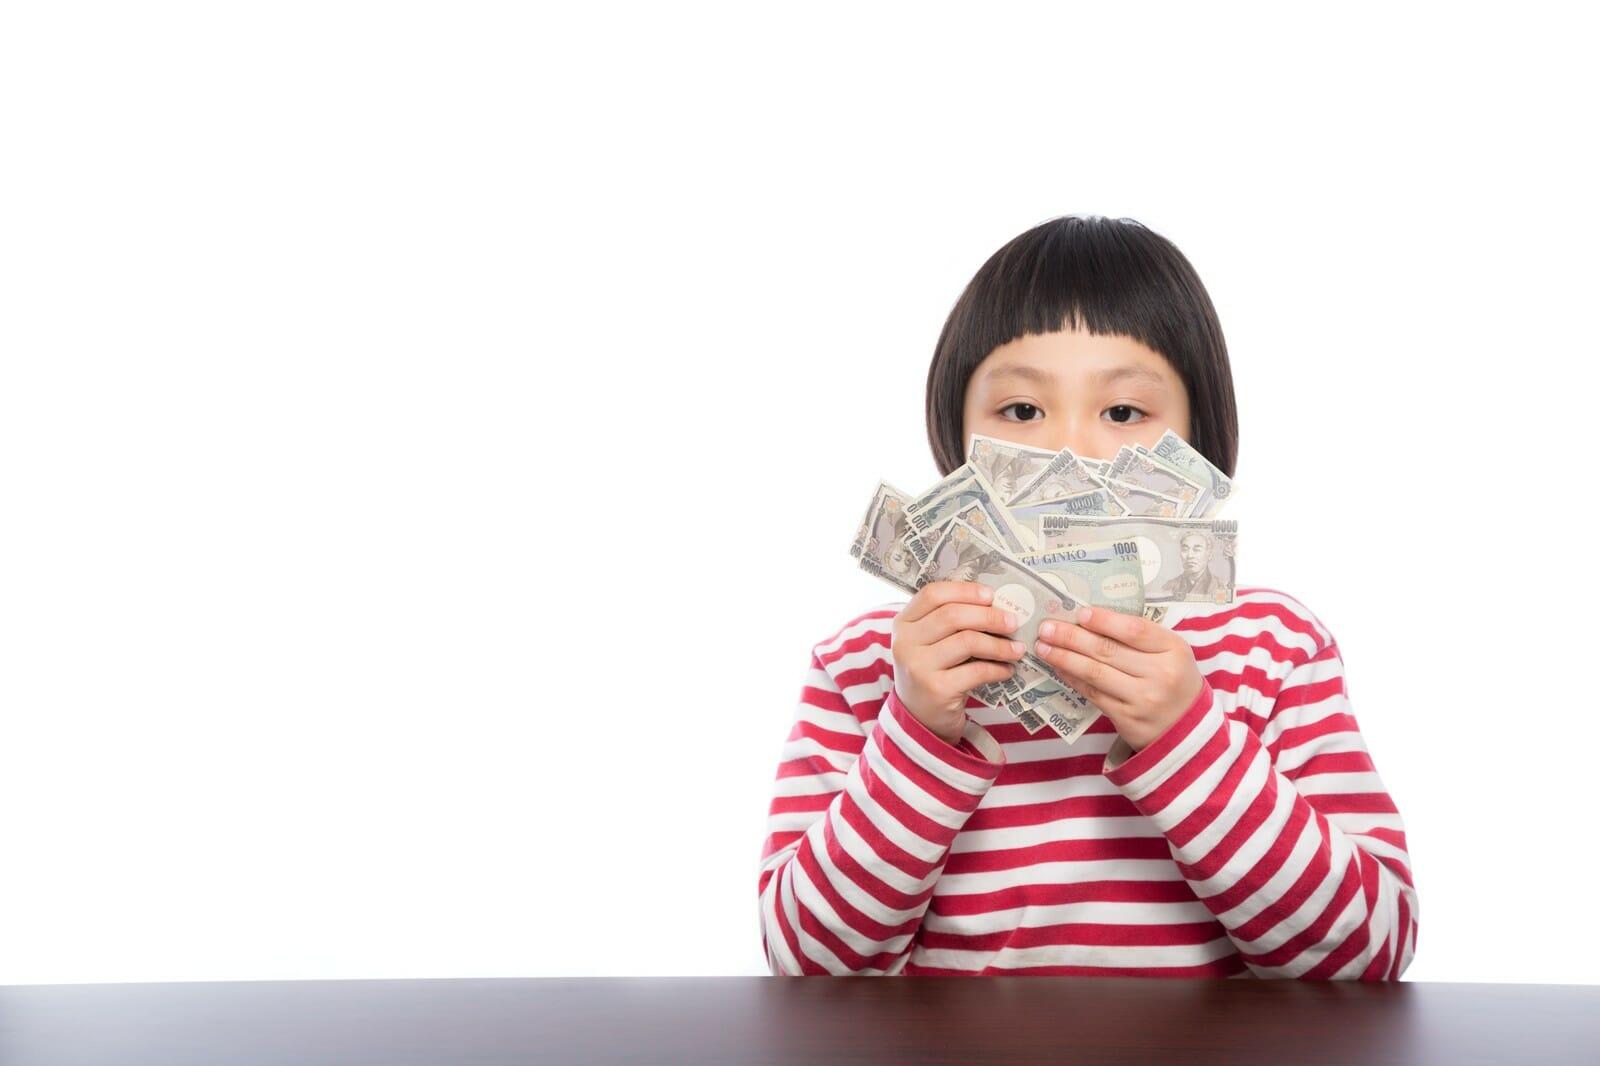 【FX体験談】余裕資金で気軽にFX